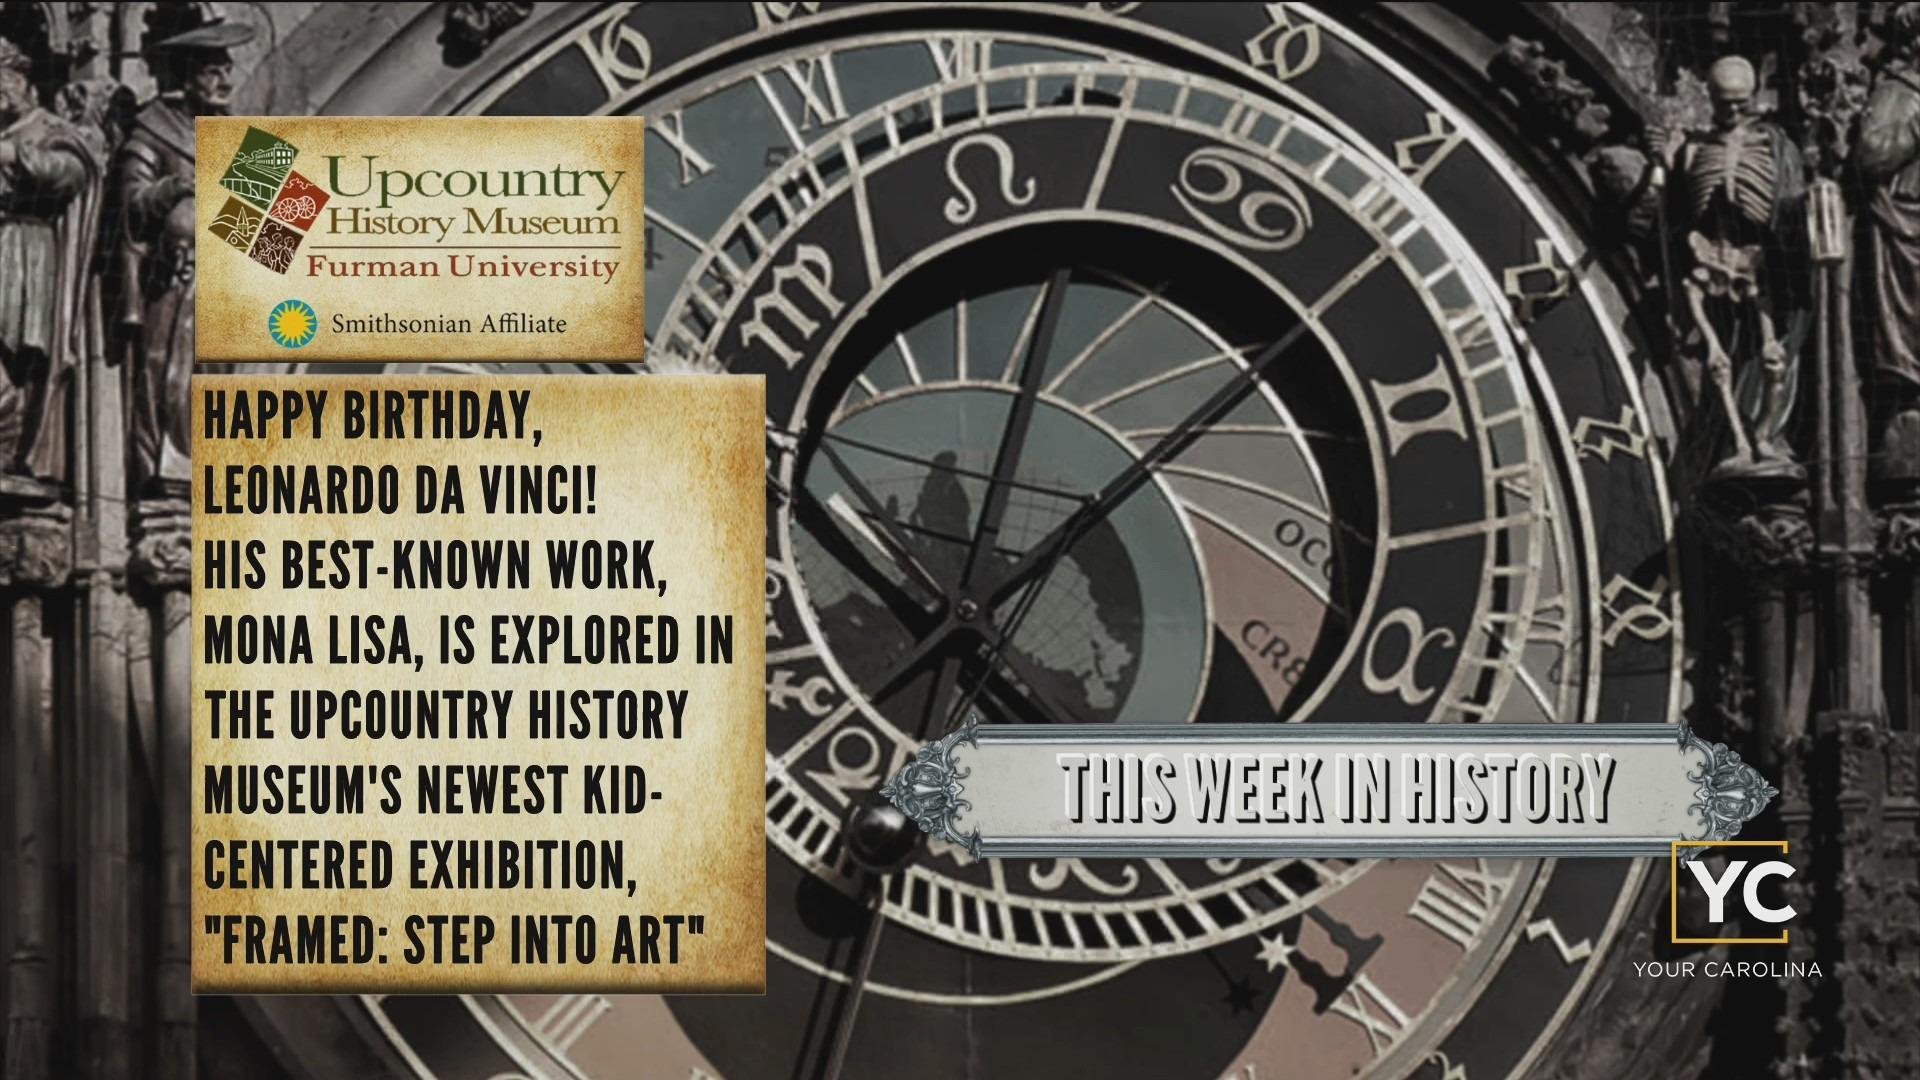 This Week In History - Happy Birthday, Leonardo da Vinci!